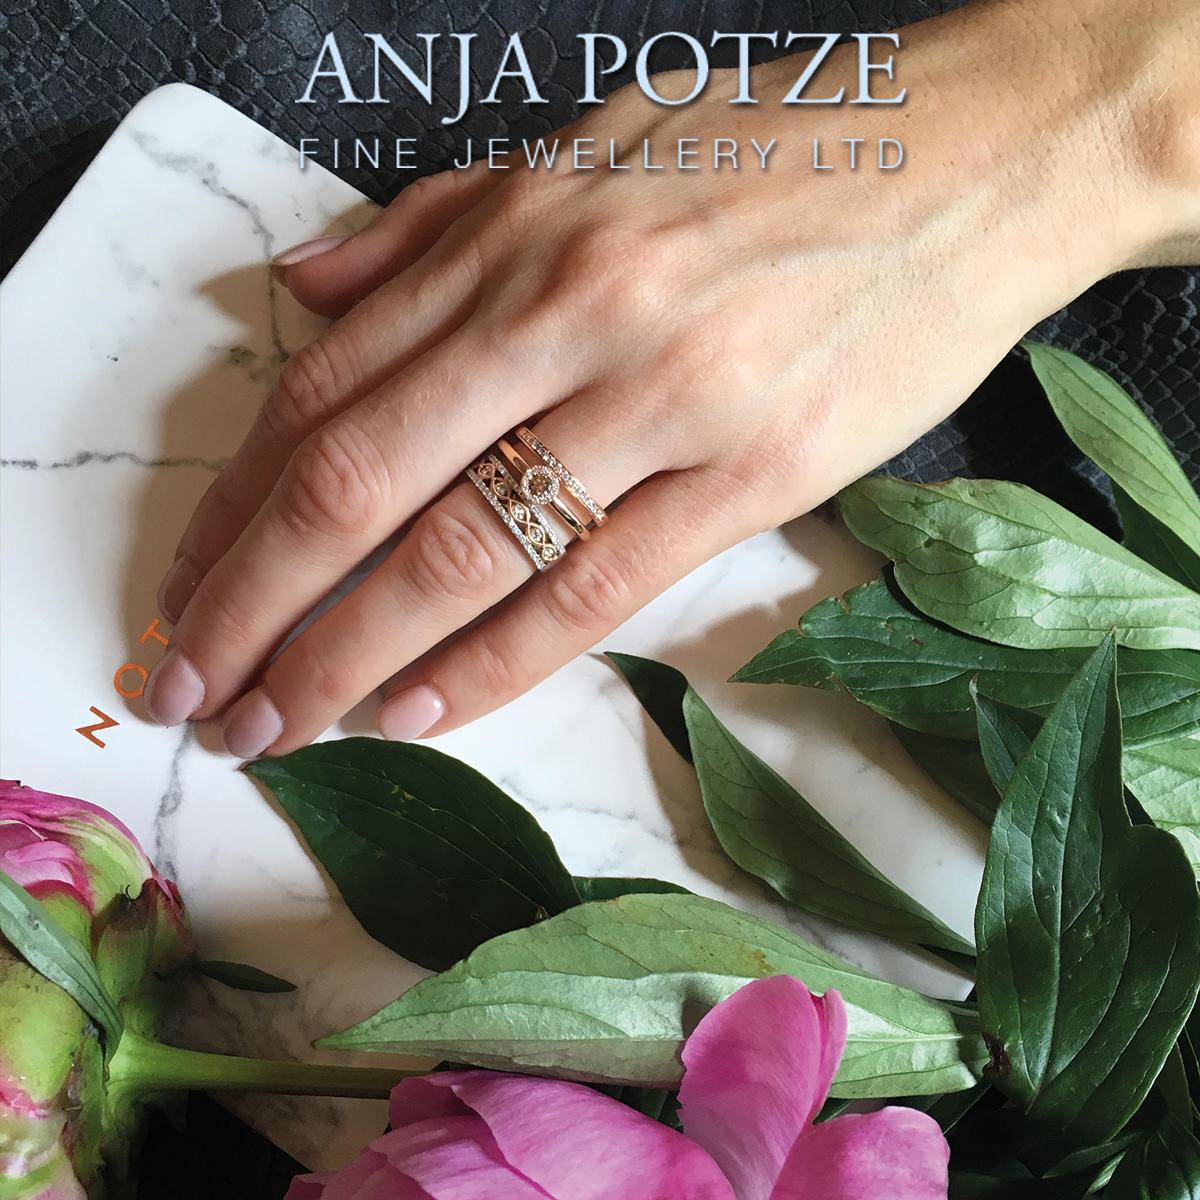 A match made in heaven! #AnjaPotze #finejewellery #10FriarStreet #weddingrings